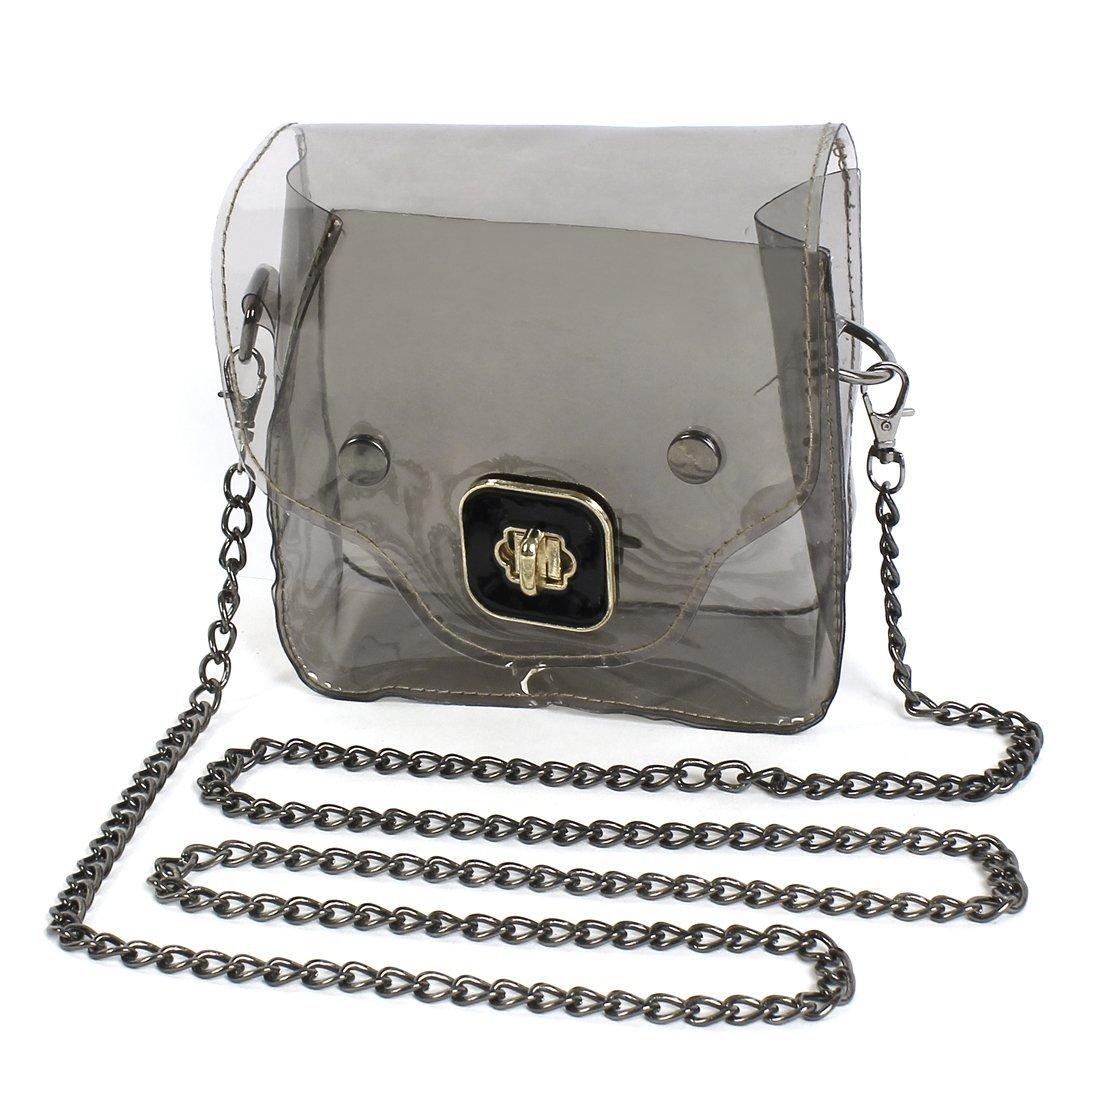 TFTP New jelly Transparent Shoulder Bag women small chian bag fashion shopping hangout bags